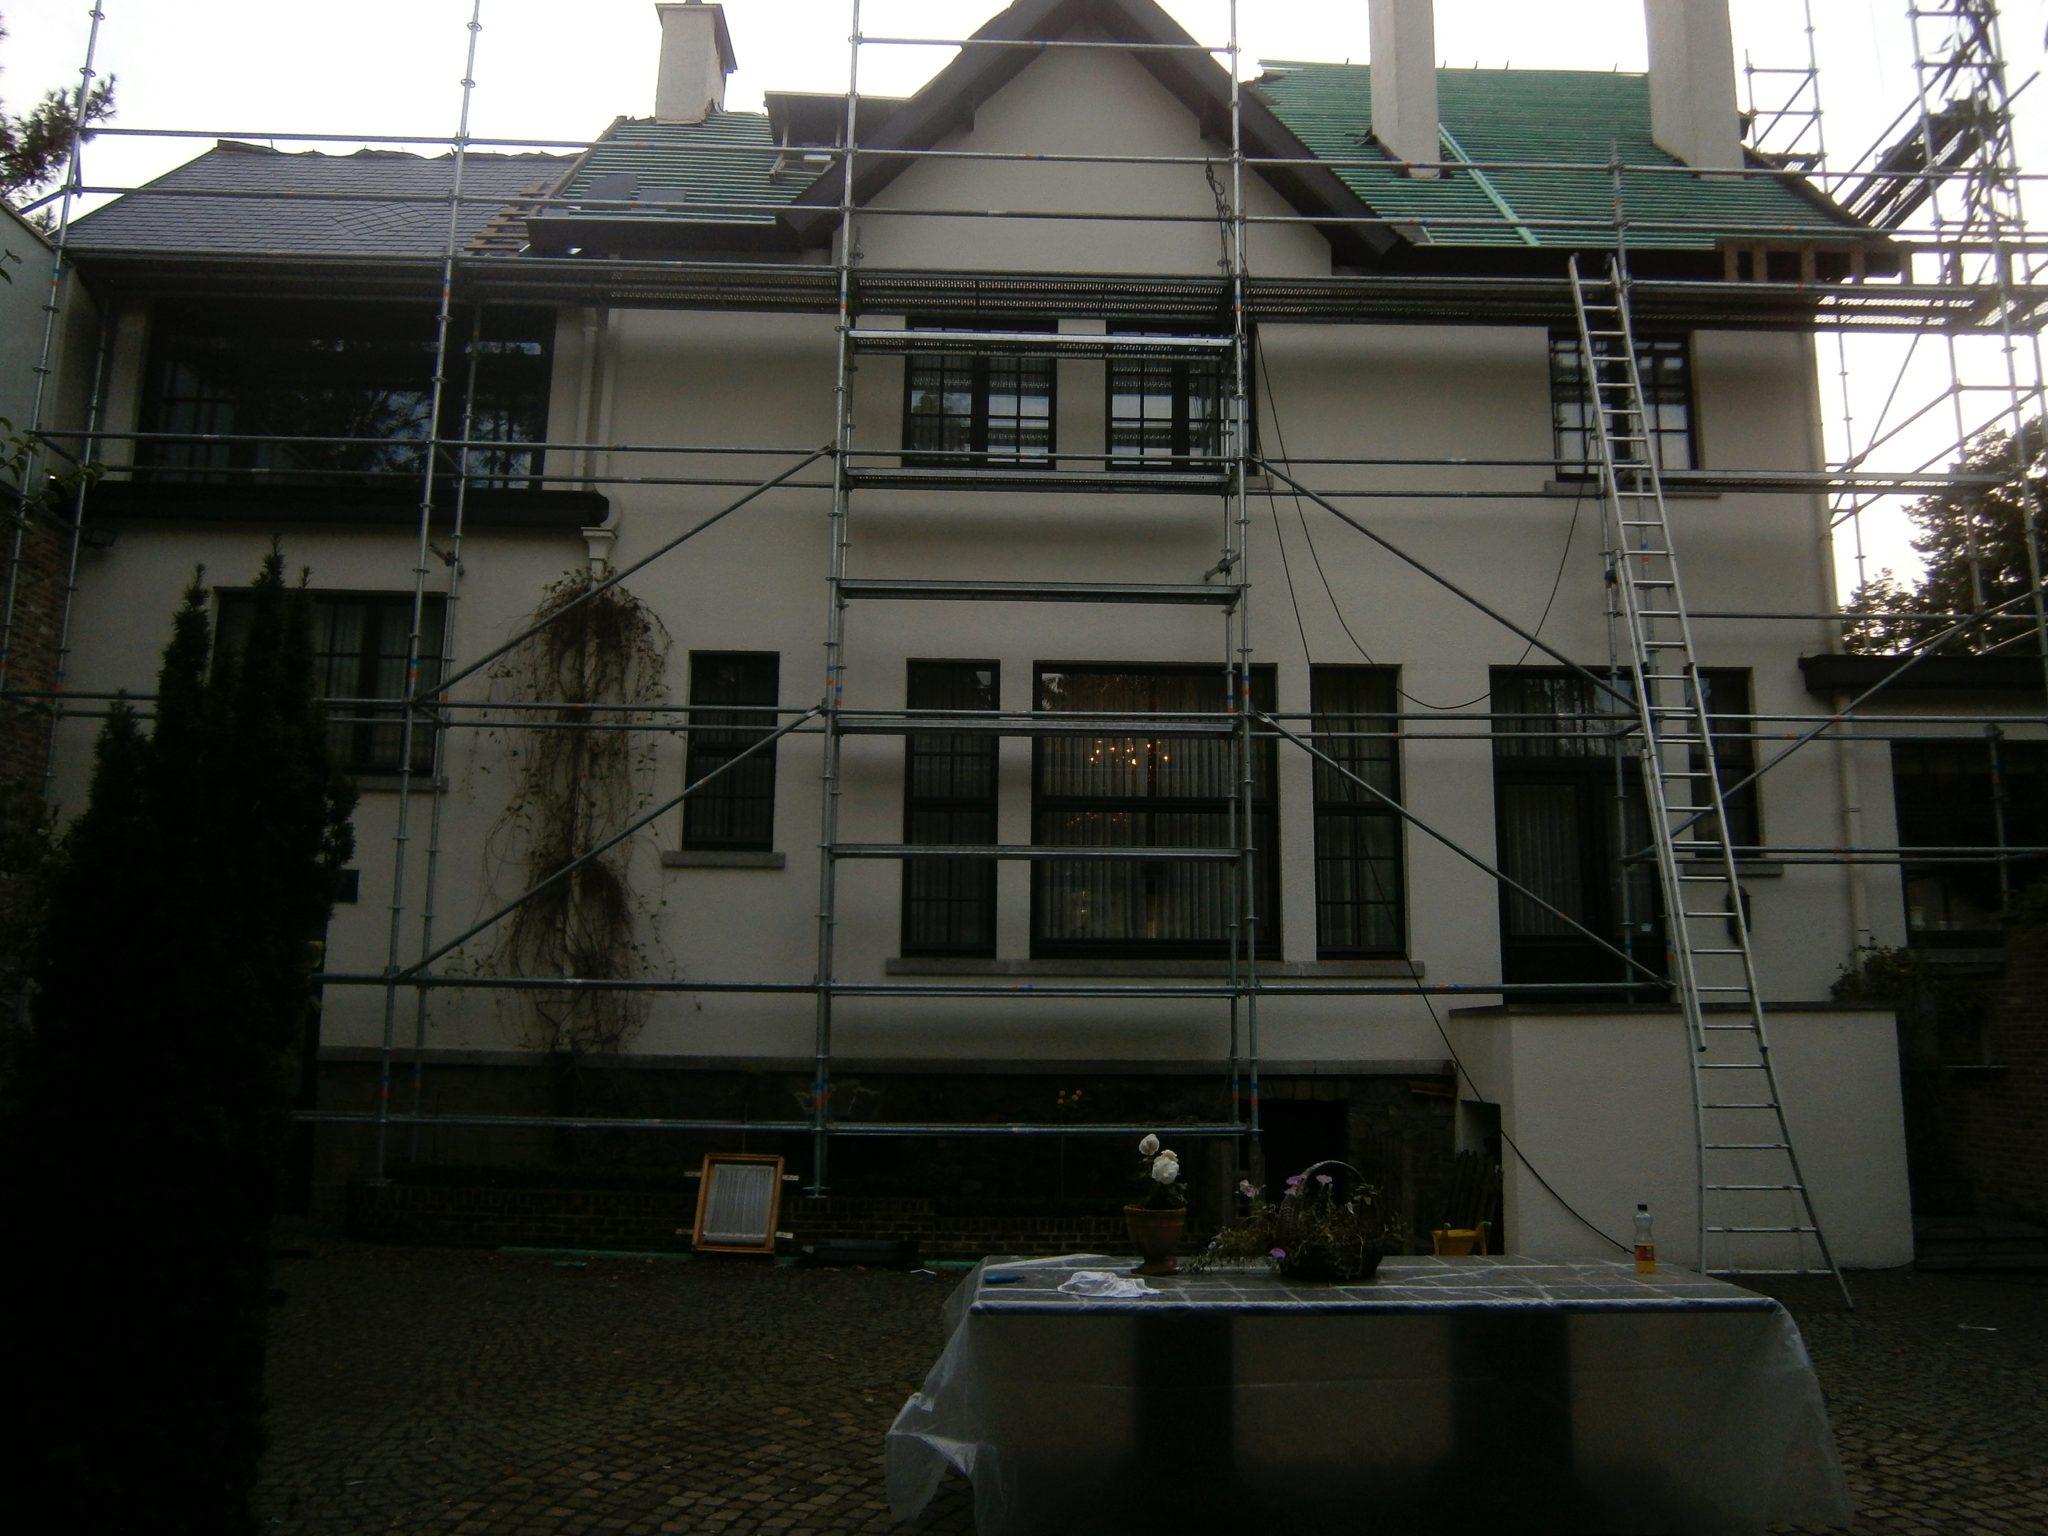 stelling renoveren dak